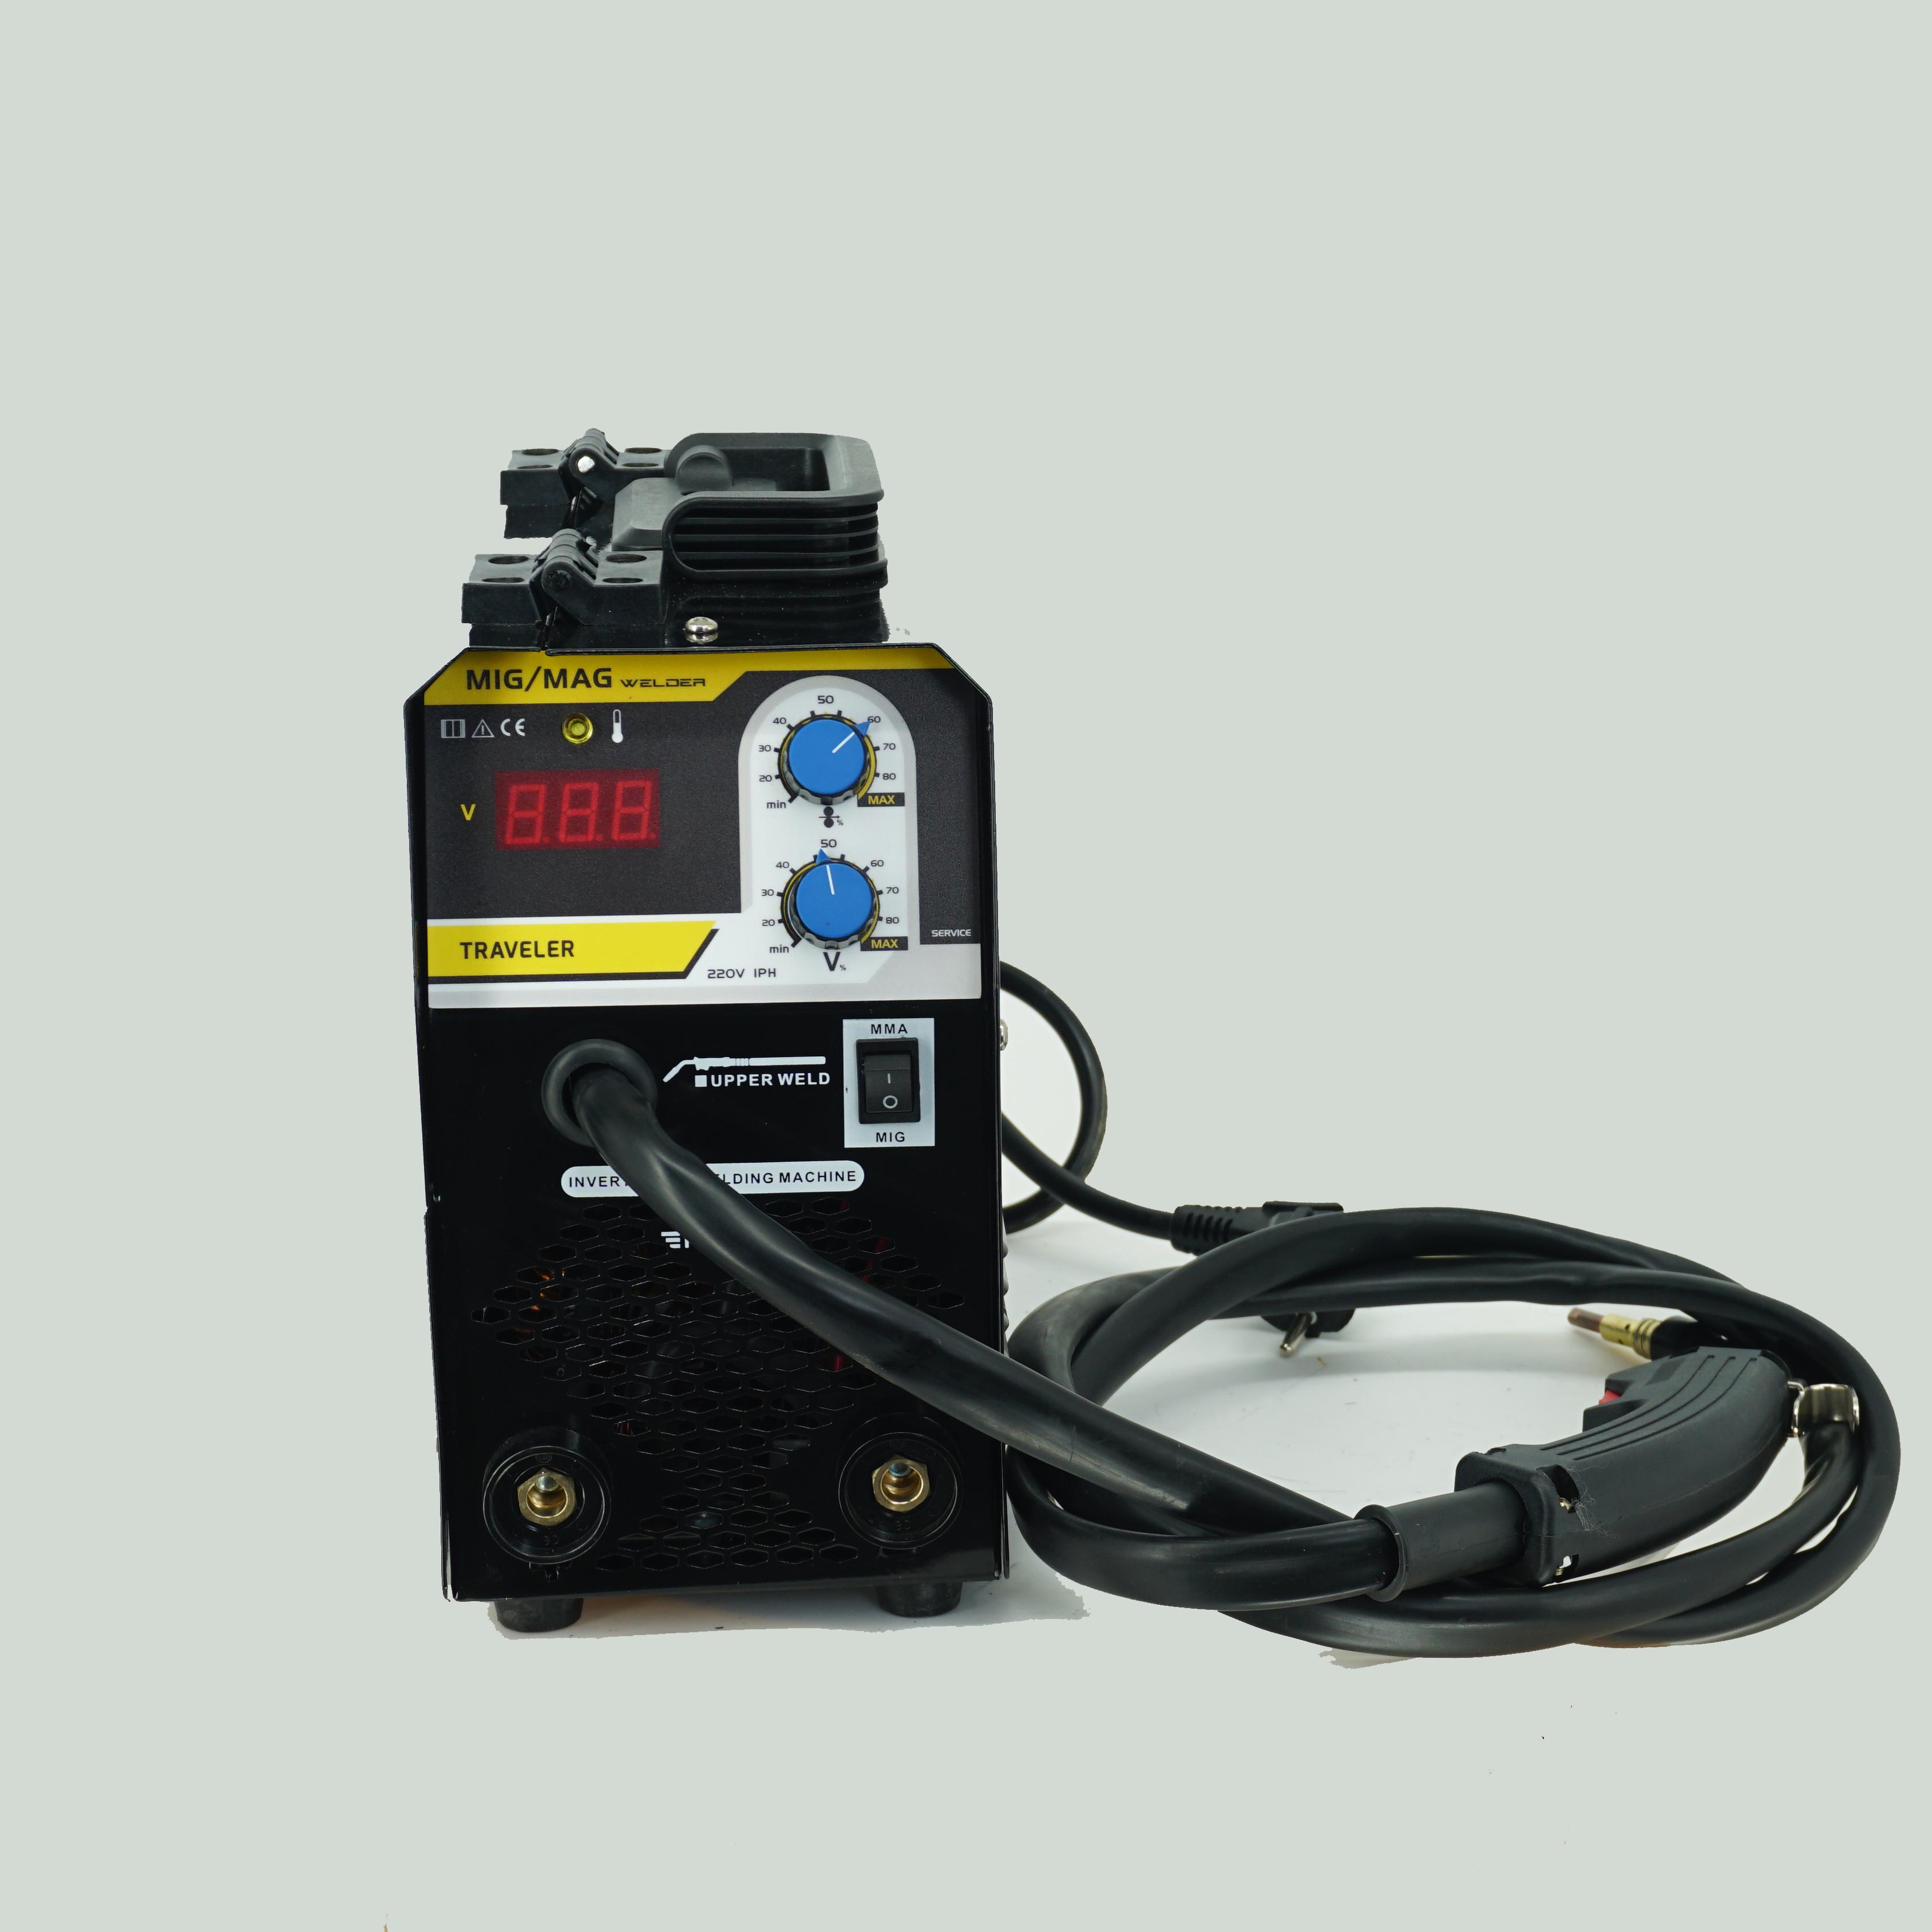 hoge kwaliteit IGBT dc inverter lasmachine prijslijst mag/mig 150